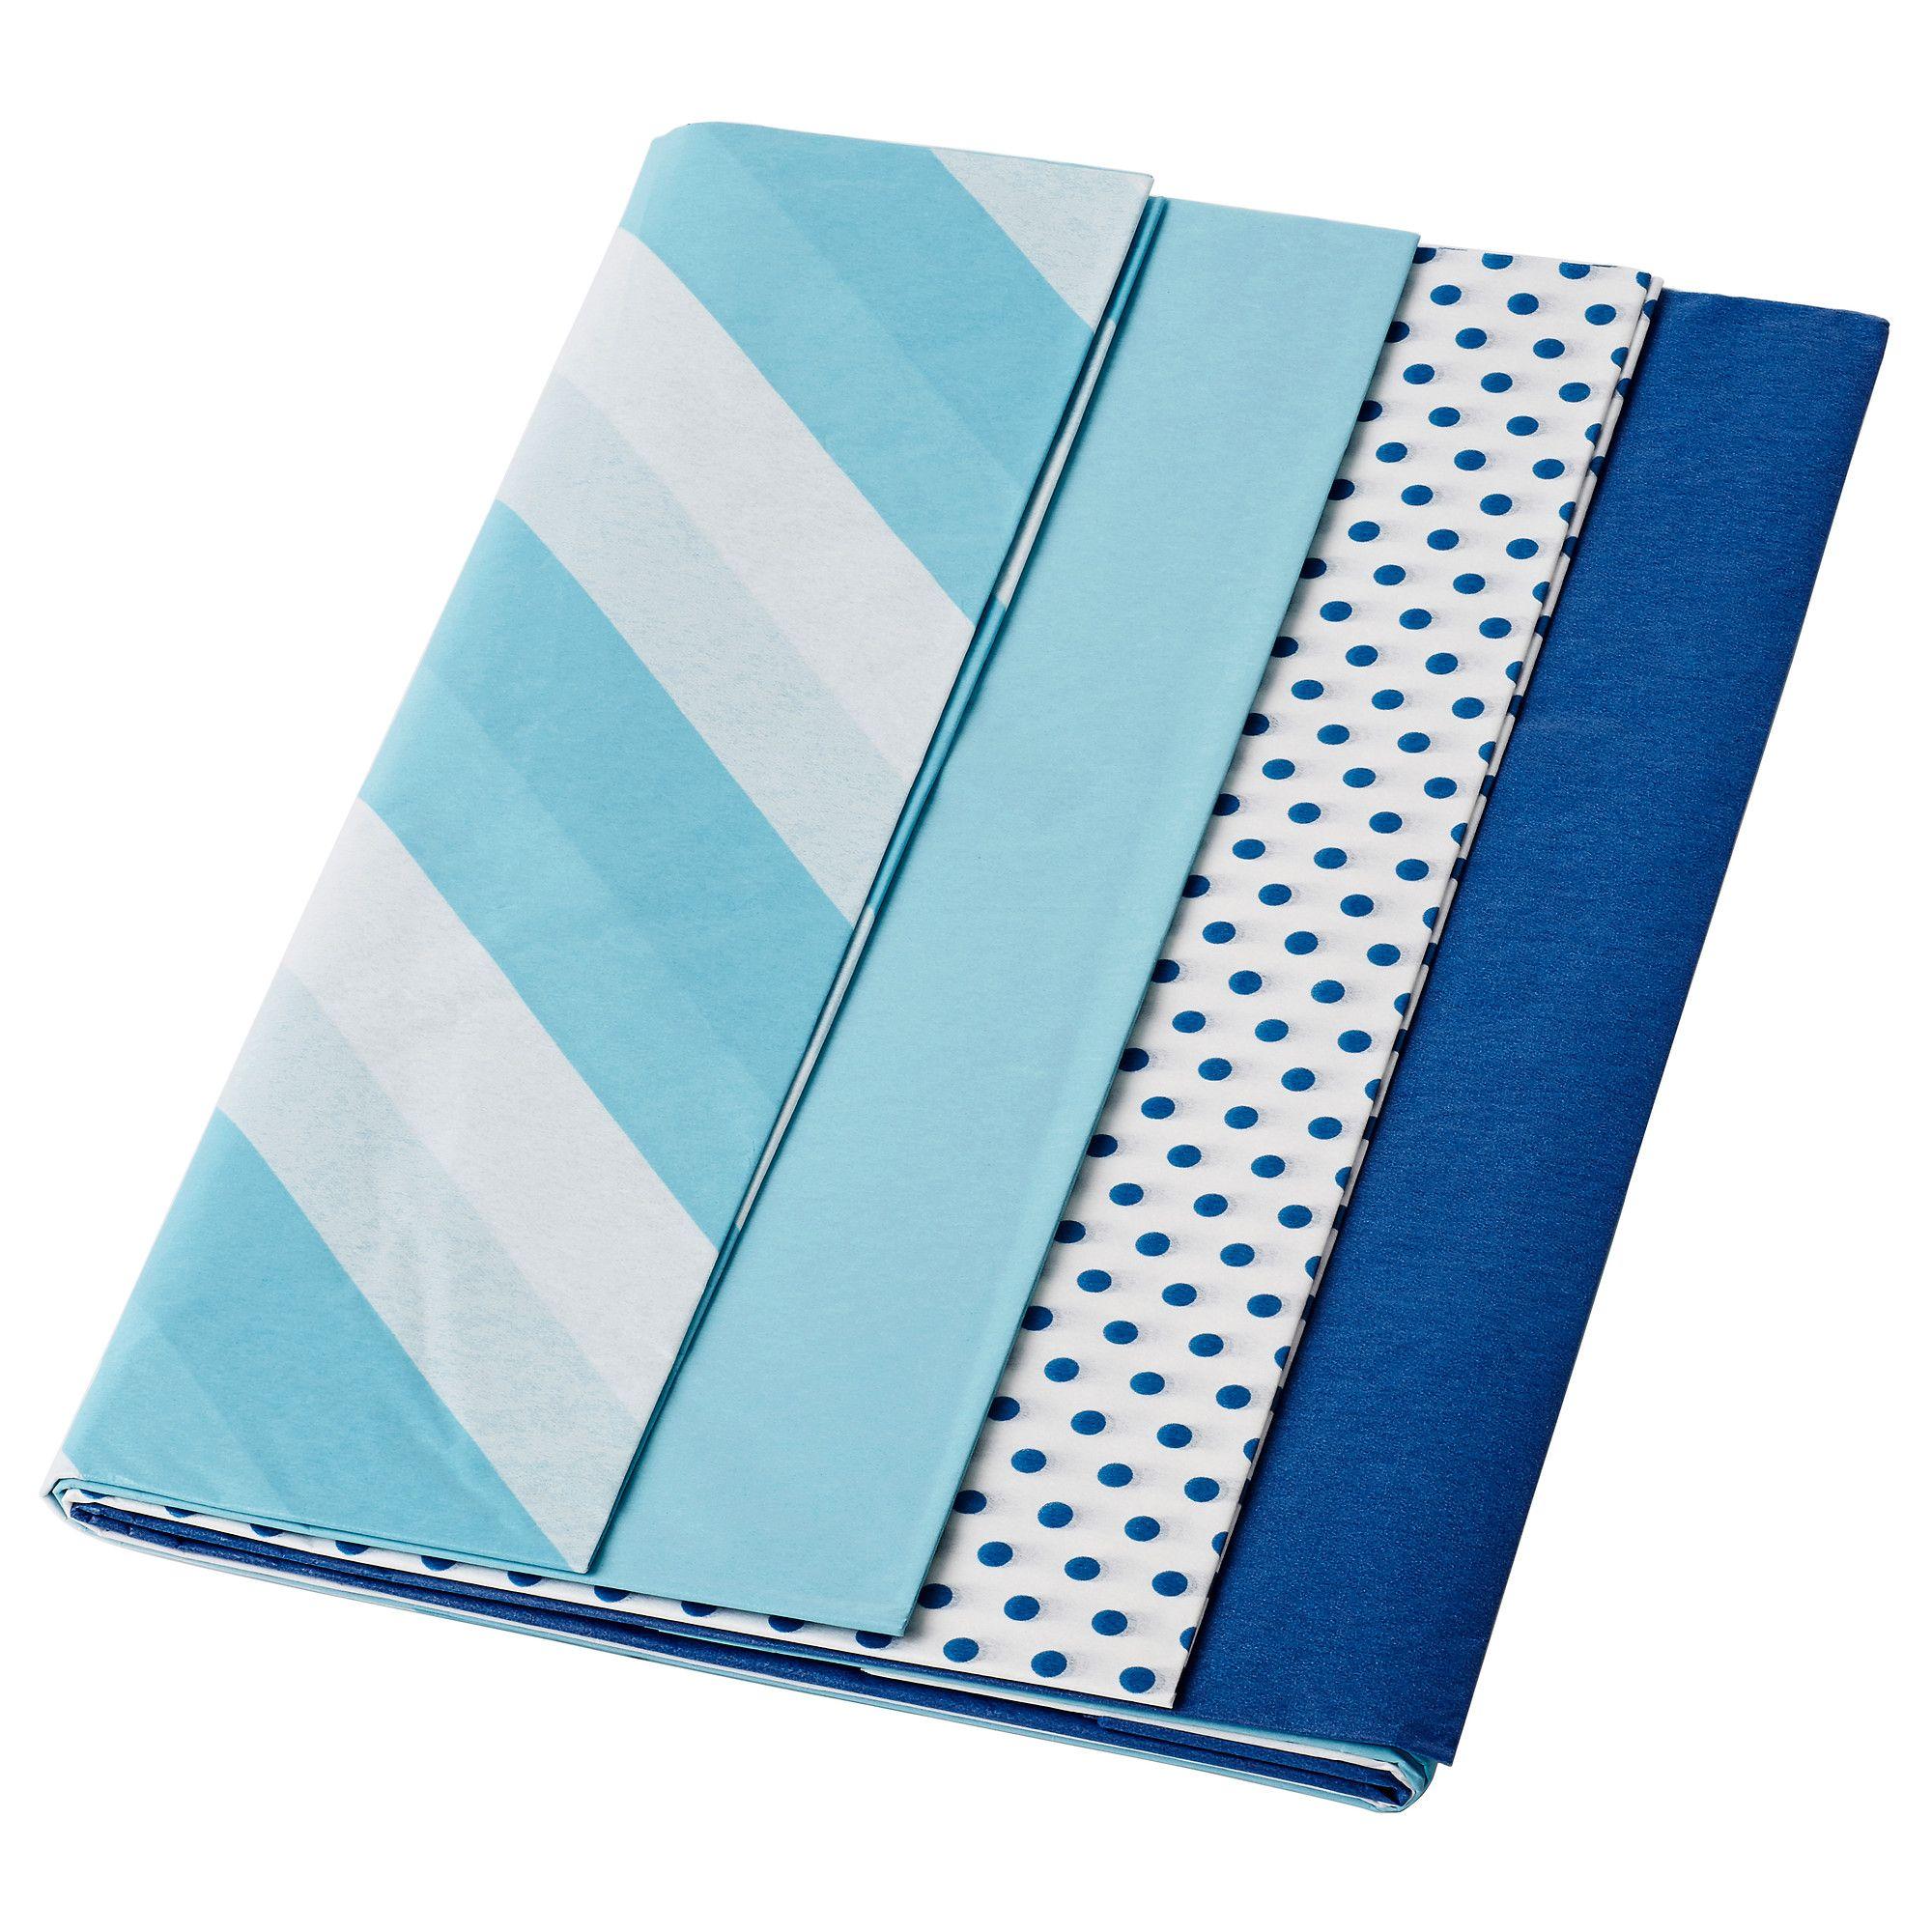 Papierle Ikea framställa hodvábny papier ikea paper